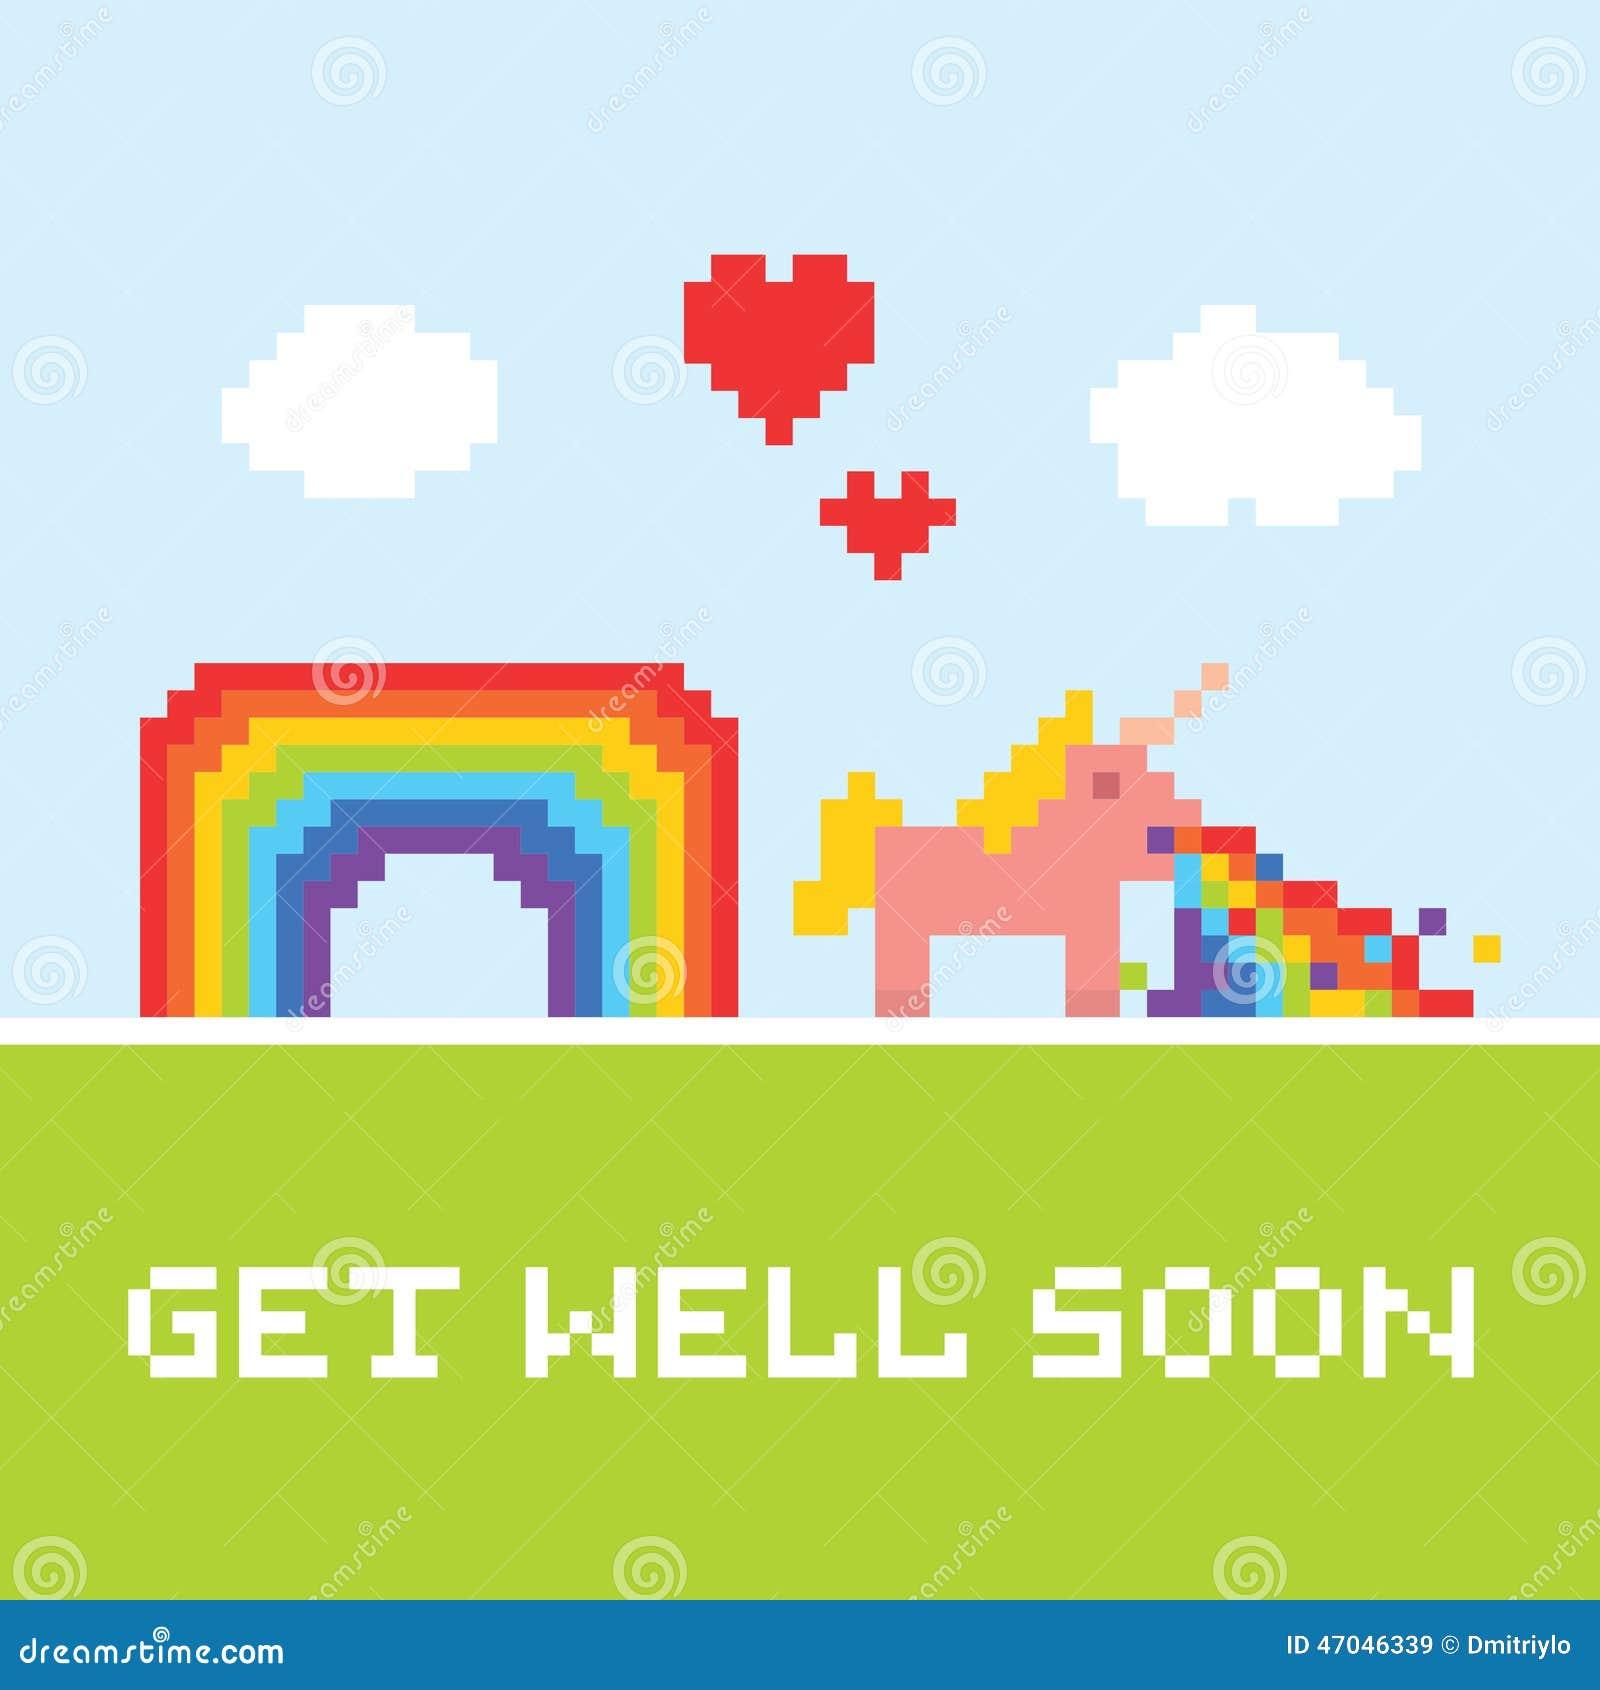 Get: Get Well Soon Unicorn Stock Vector. Illustration Of Magic